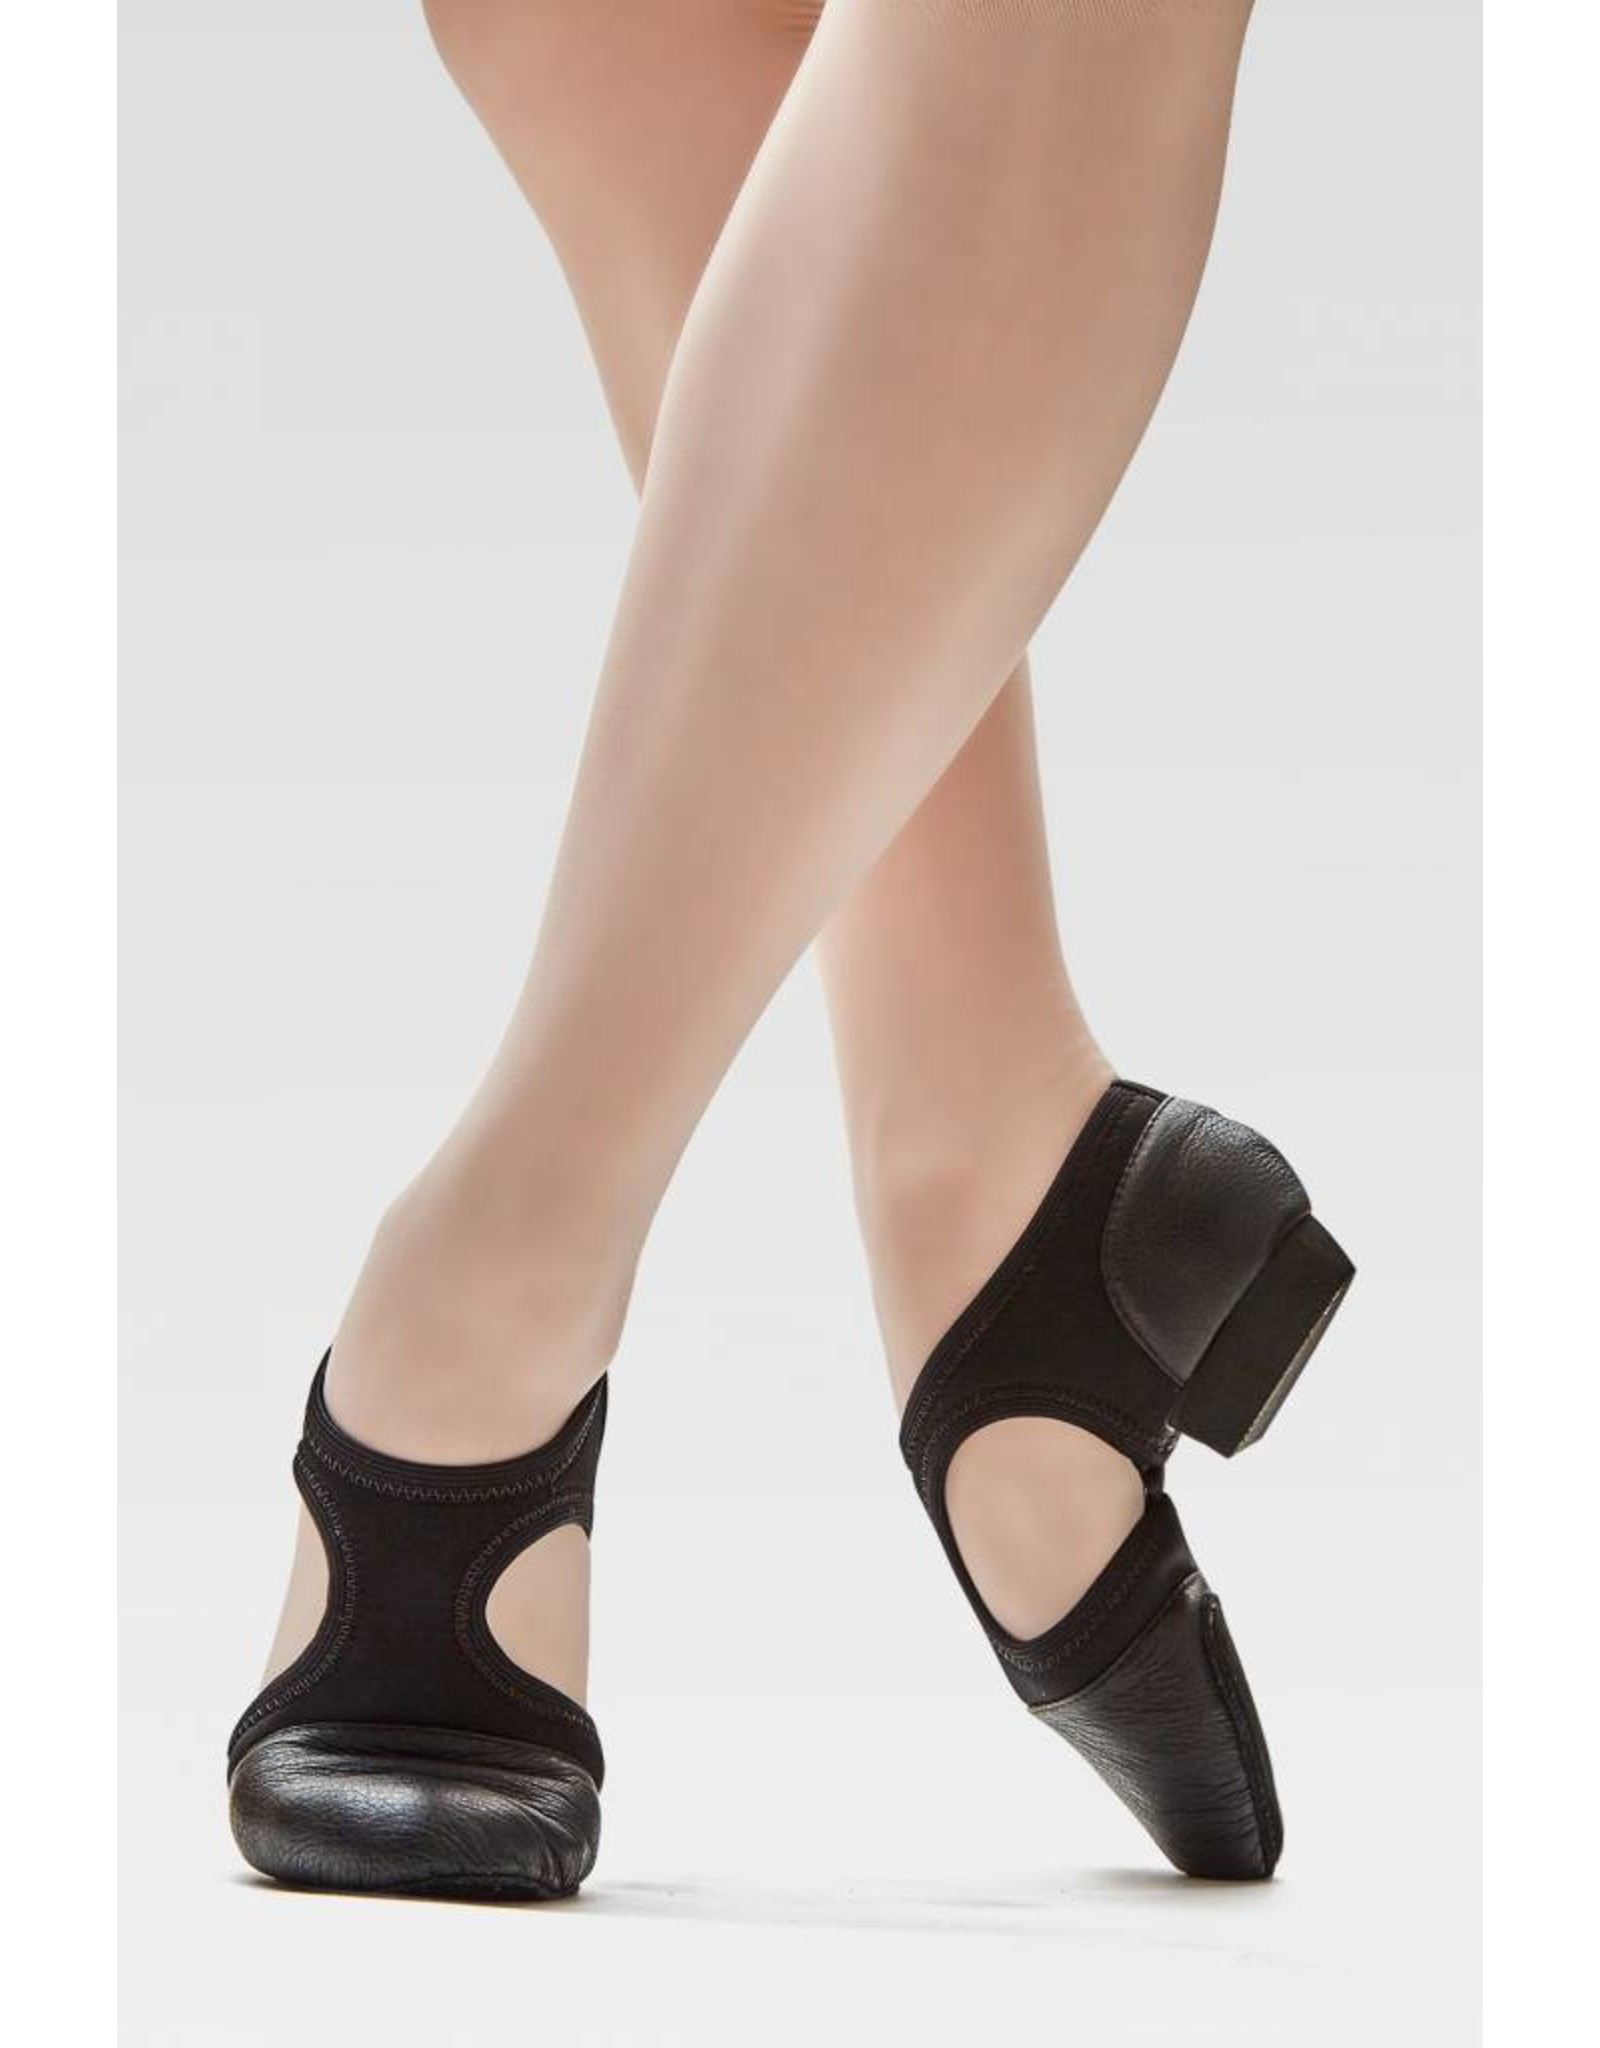 SoDanća JZ44 Pedini Jazz Shoe  BLACK